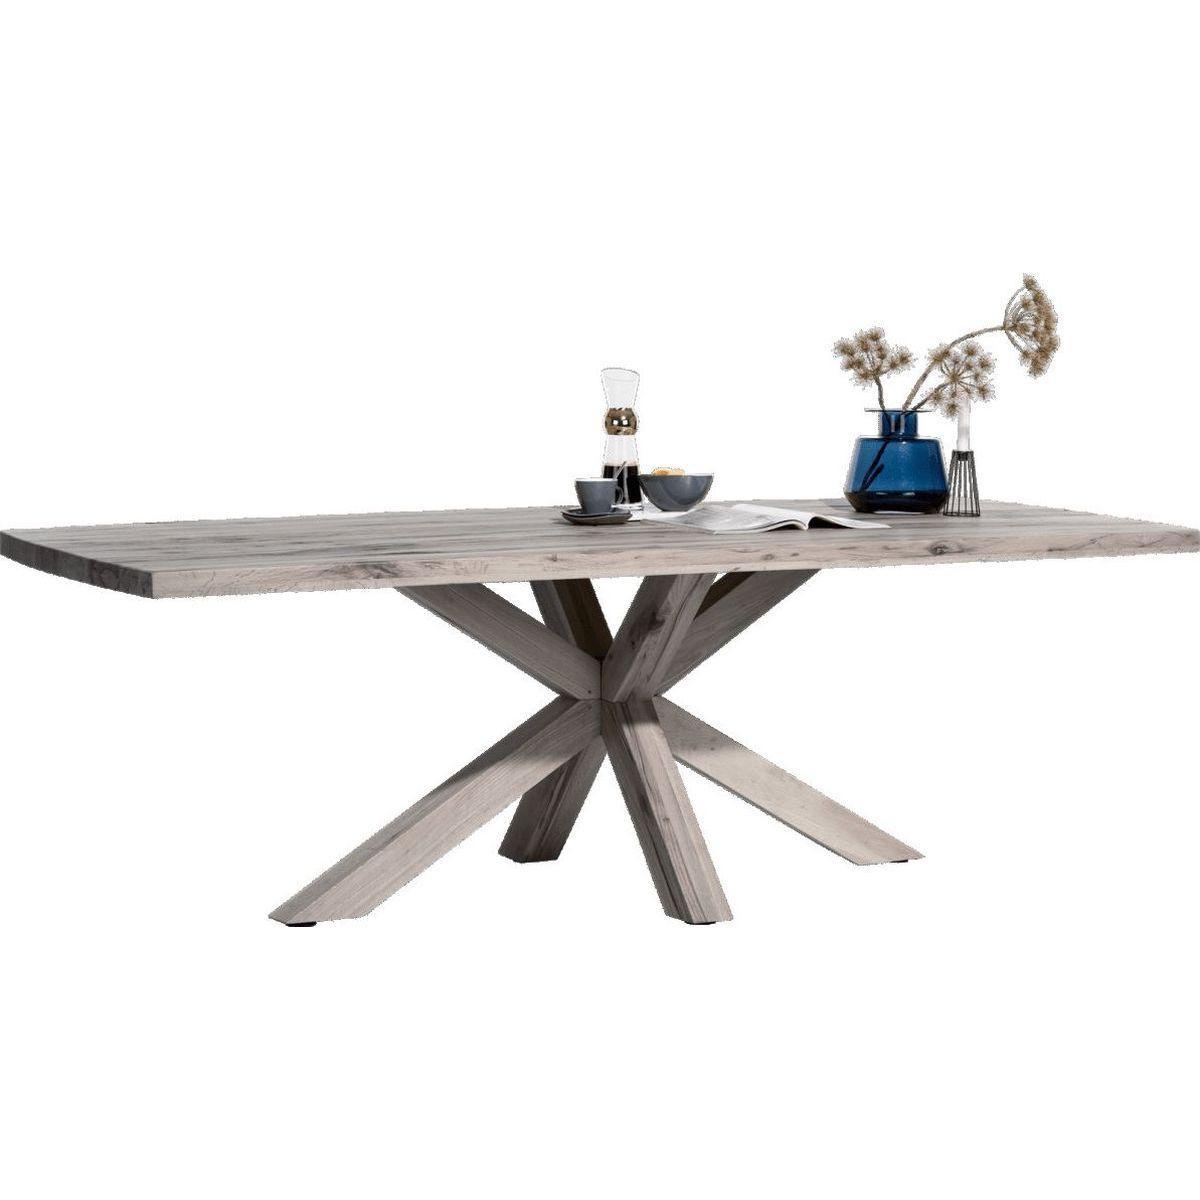 Table 105x240cm MAESTRO HetH plumb